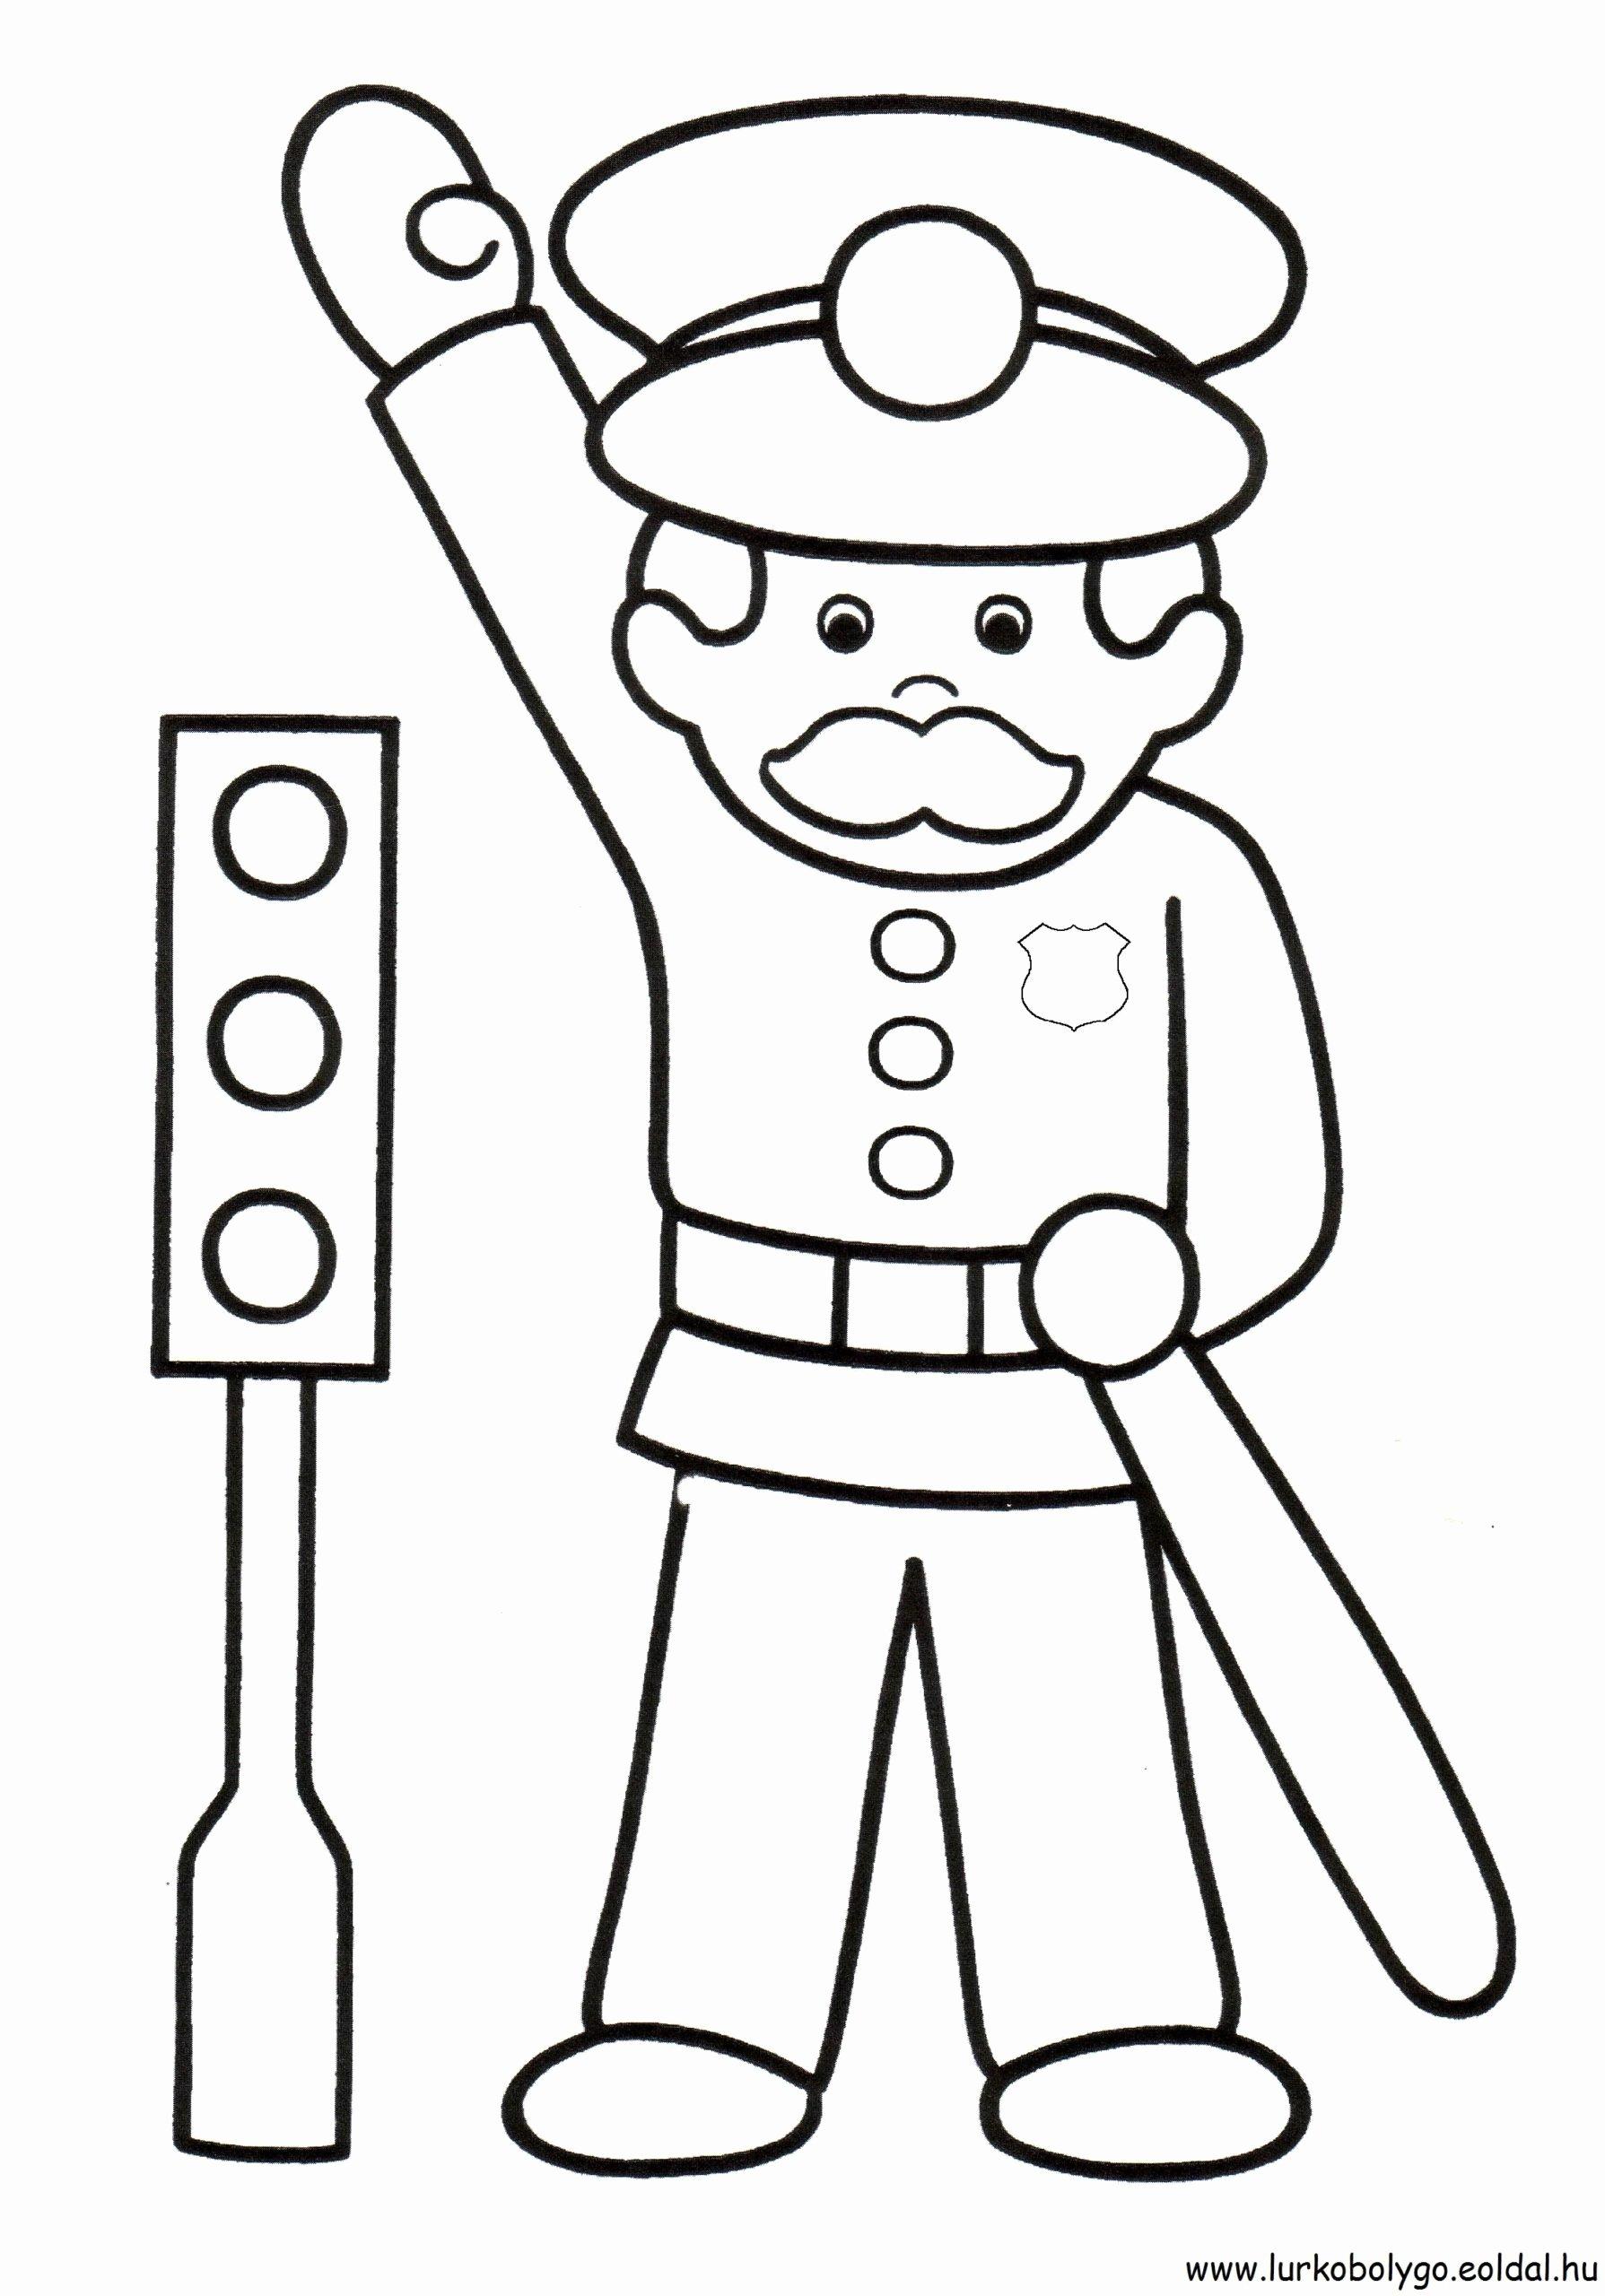 Road Safety Worksheets for Preschoolers Best Of Traffic Police Worksheet Printable Worksheets and Activities